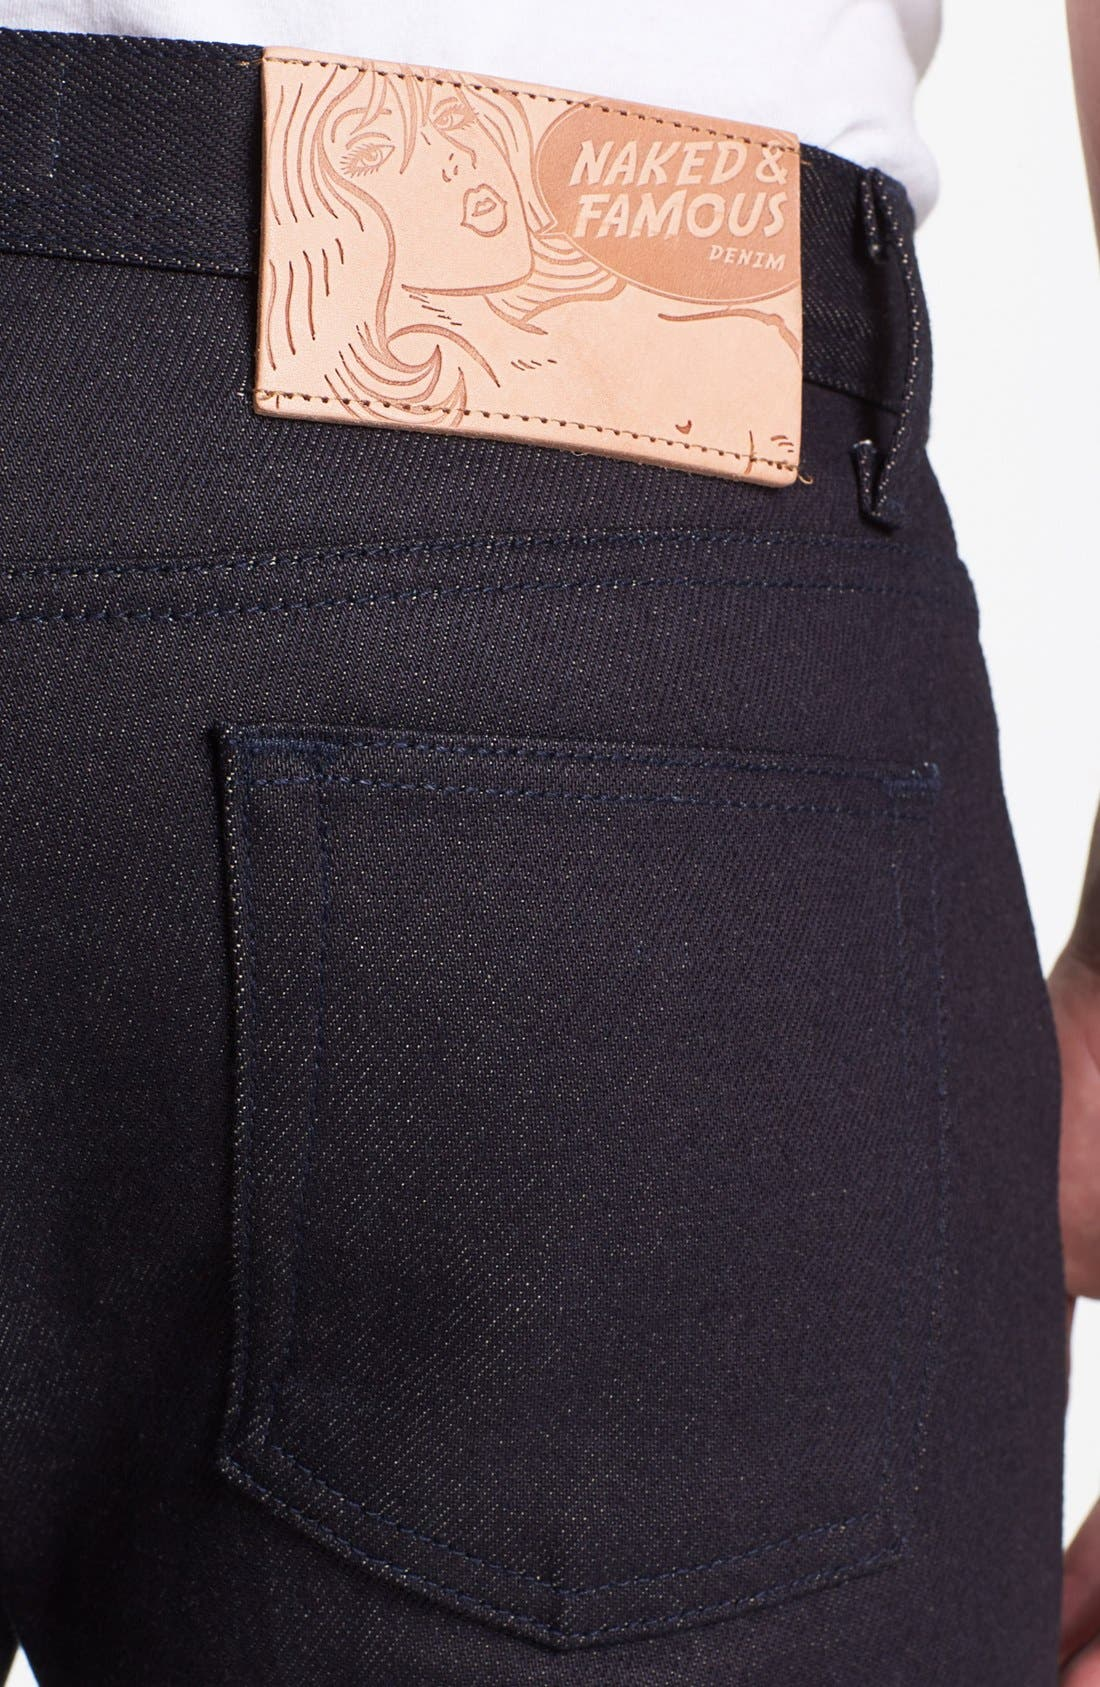 Alternate Image 4  - Naked & Famous Denim 'Weird Guy' Slim Fit Selvedge Jeans (Elephant 3)